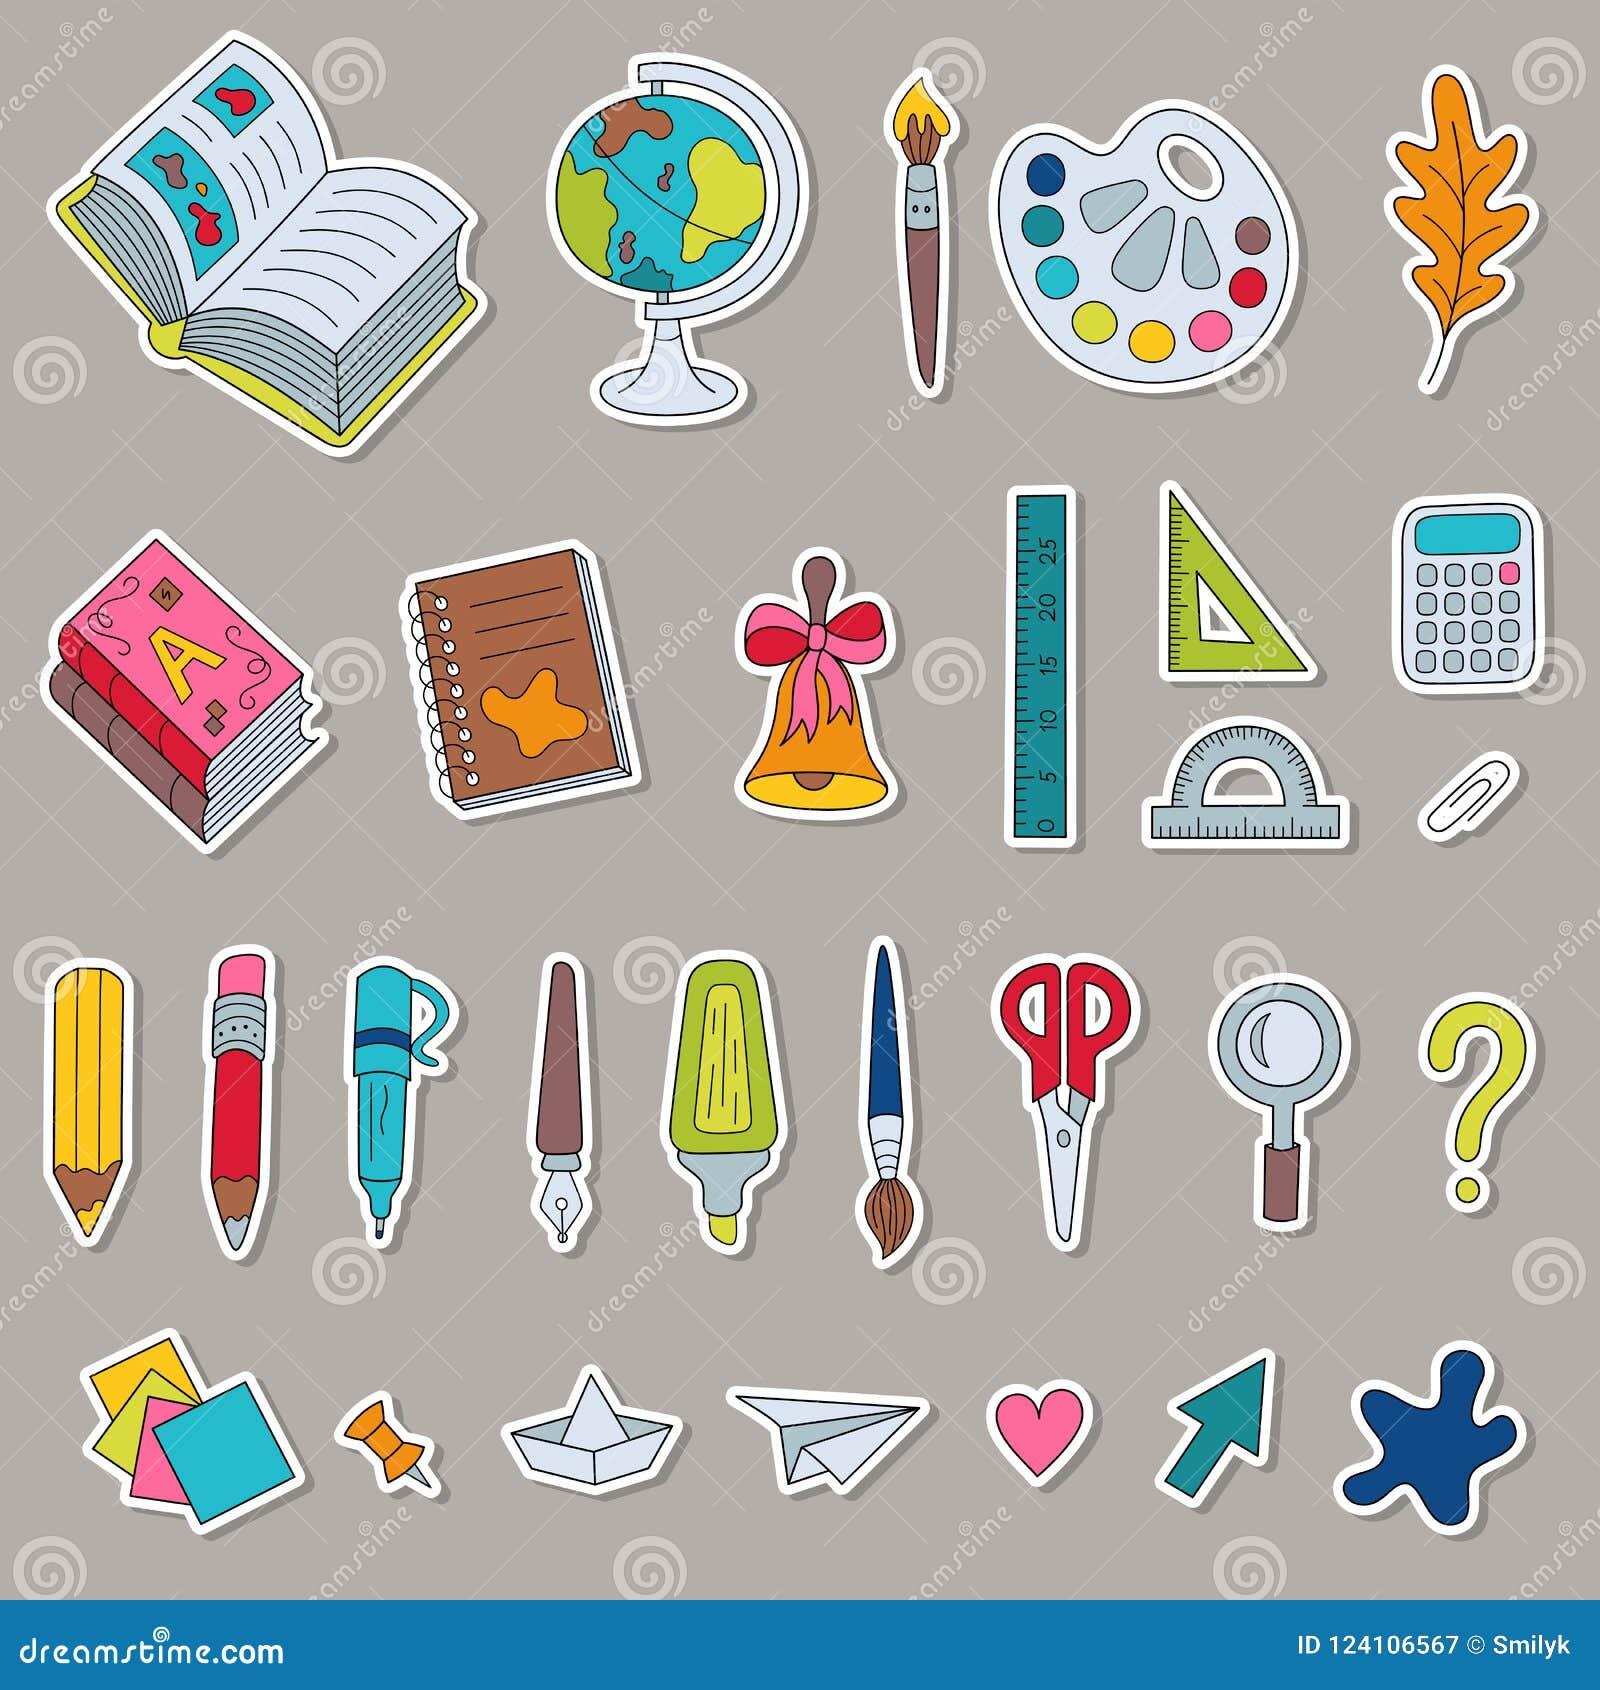 Grupo De Artigos De Papelaria Coloridos Etiquetas Da Escola Dos